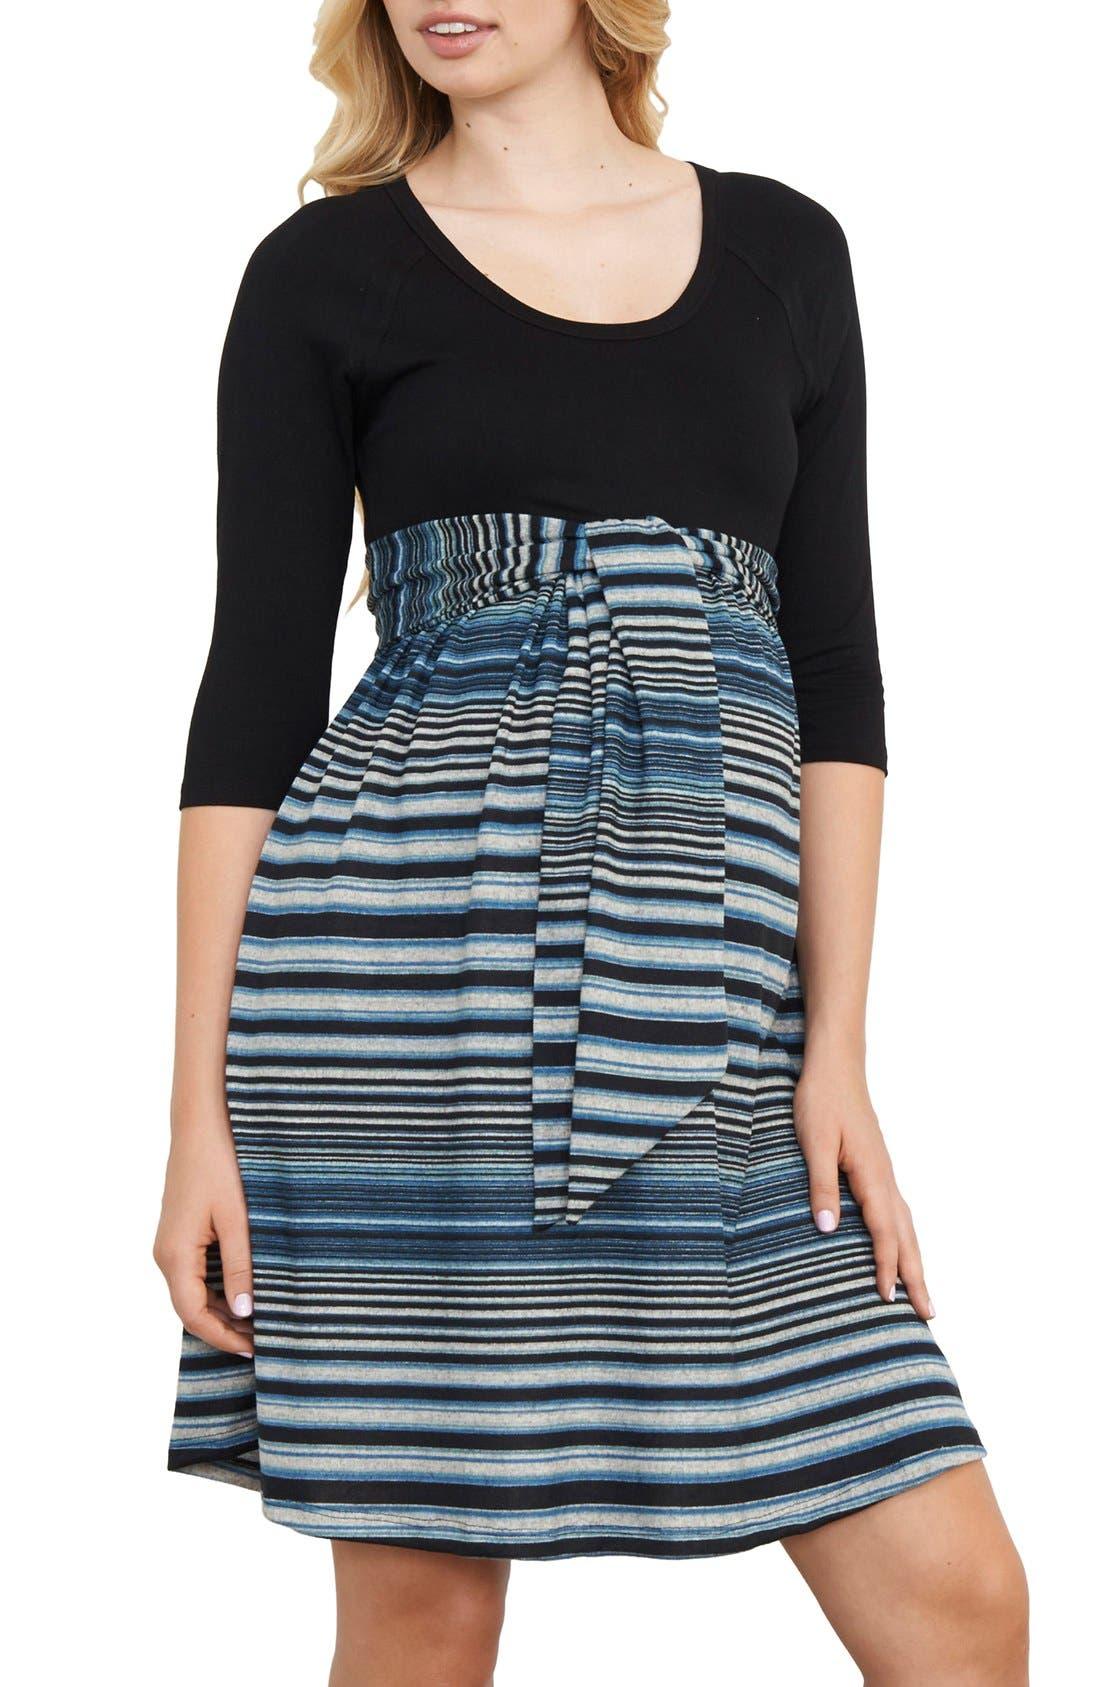 Maternal America Scoop Neck Maternity Dress